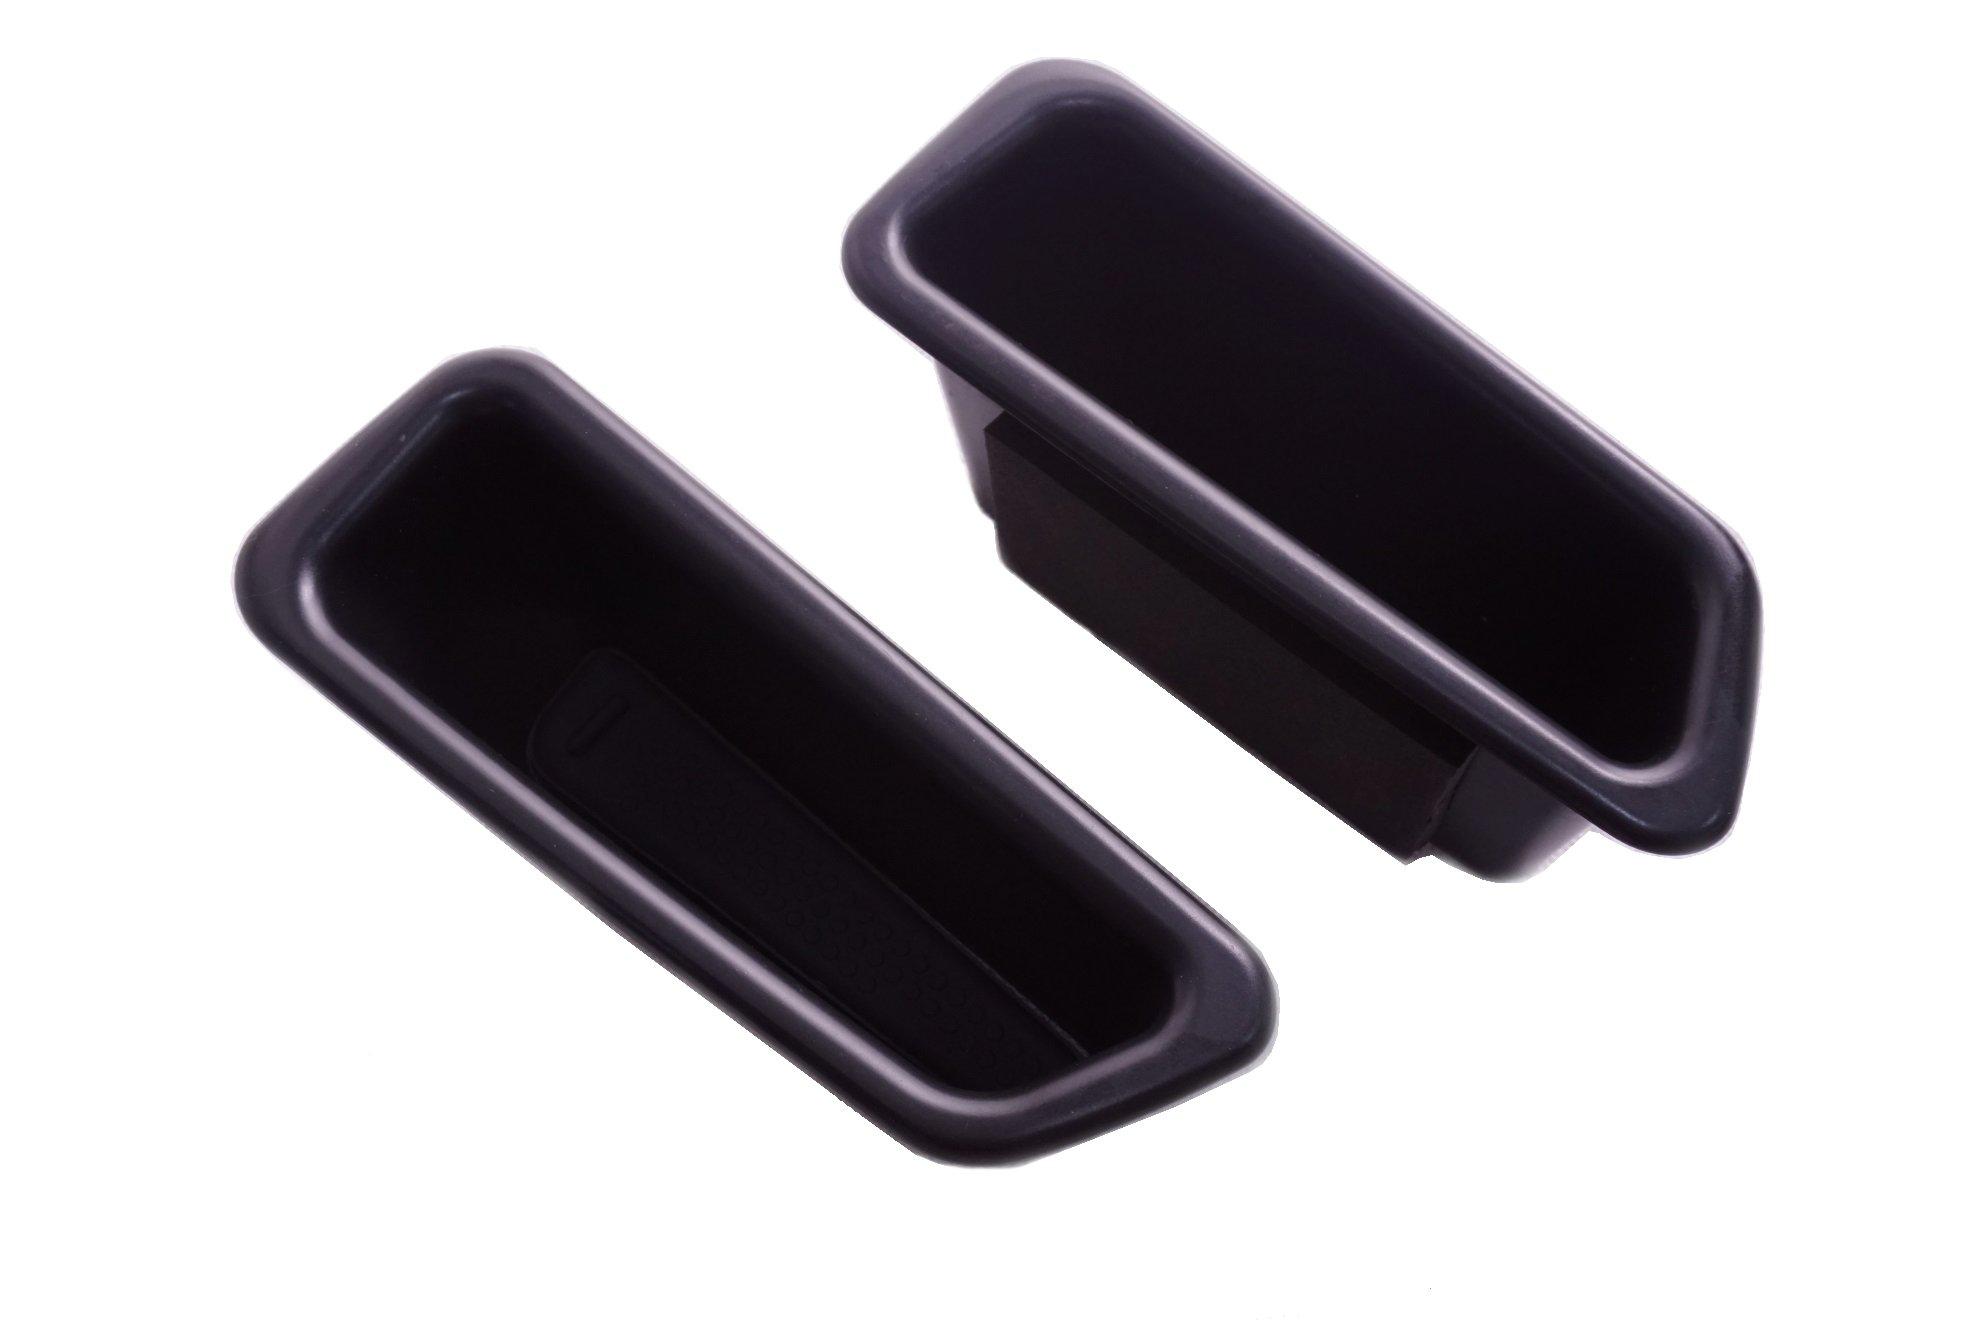 Vesul 2Pcs Black Front Row Door Side Storage Box Handle Armrest Phone Container For Volvo S60 2009-2017 V60 2009-2017